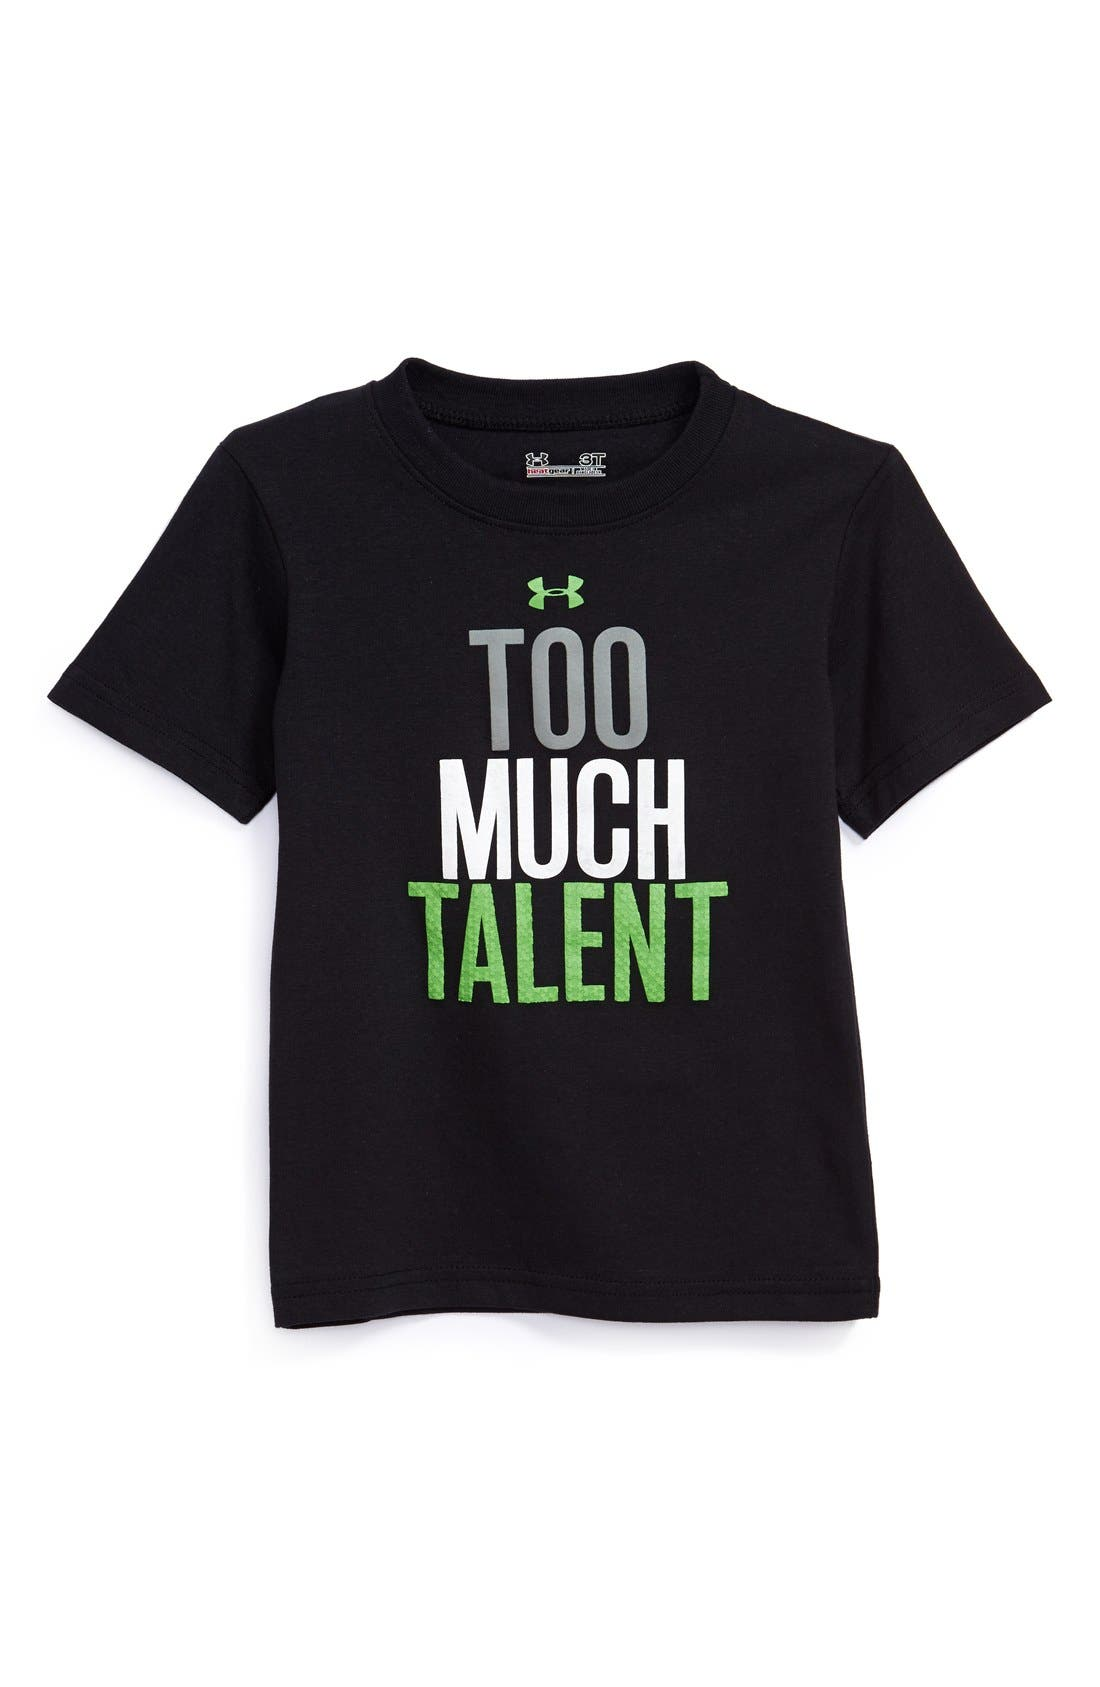 Main Image - Under Armour 'Too Much Talent' HeatGear® T-Shirt (Toddler Boys)